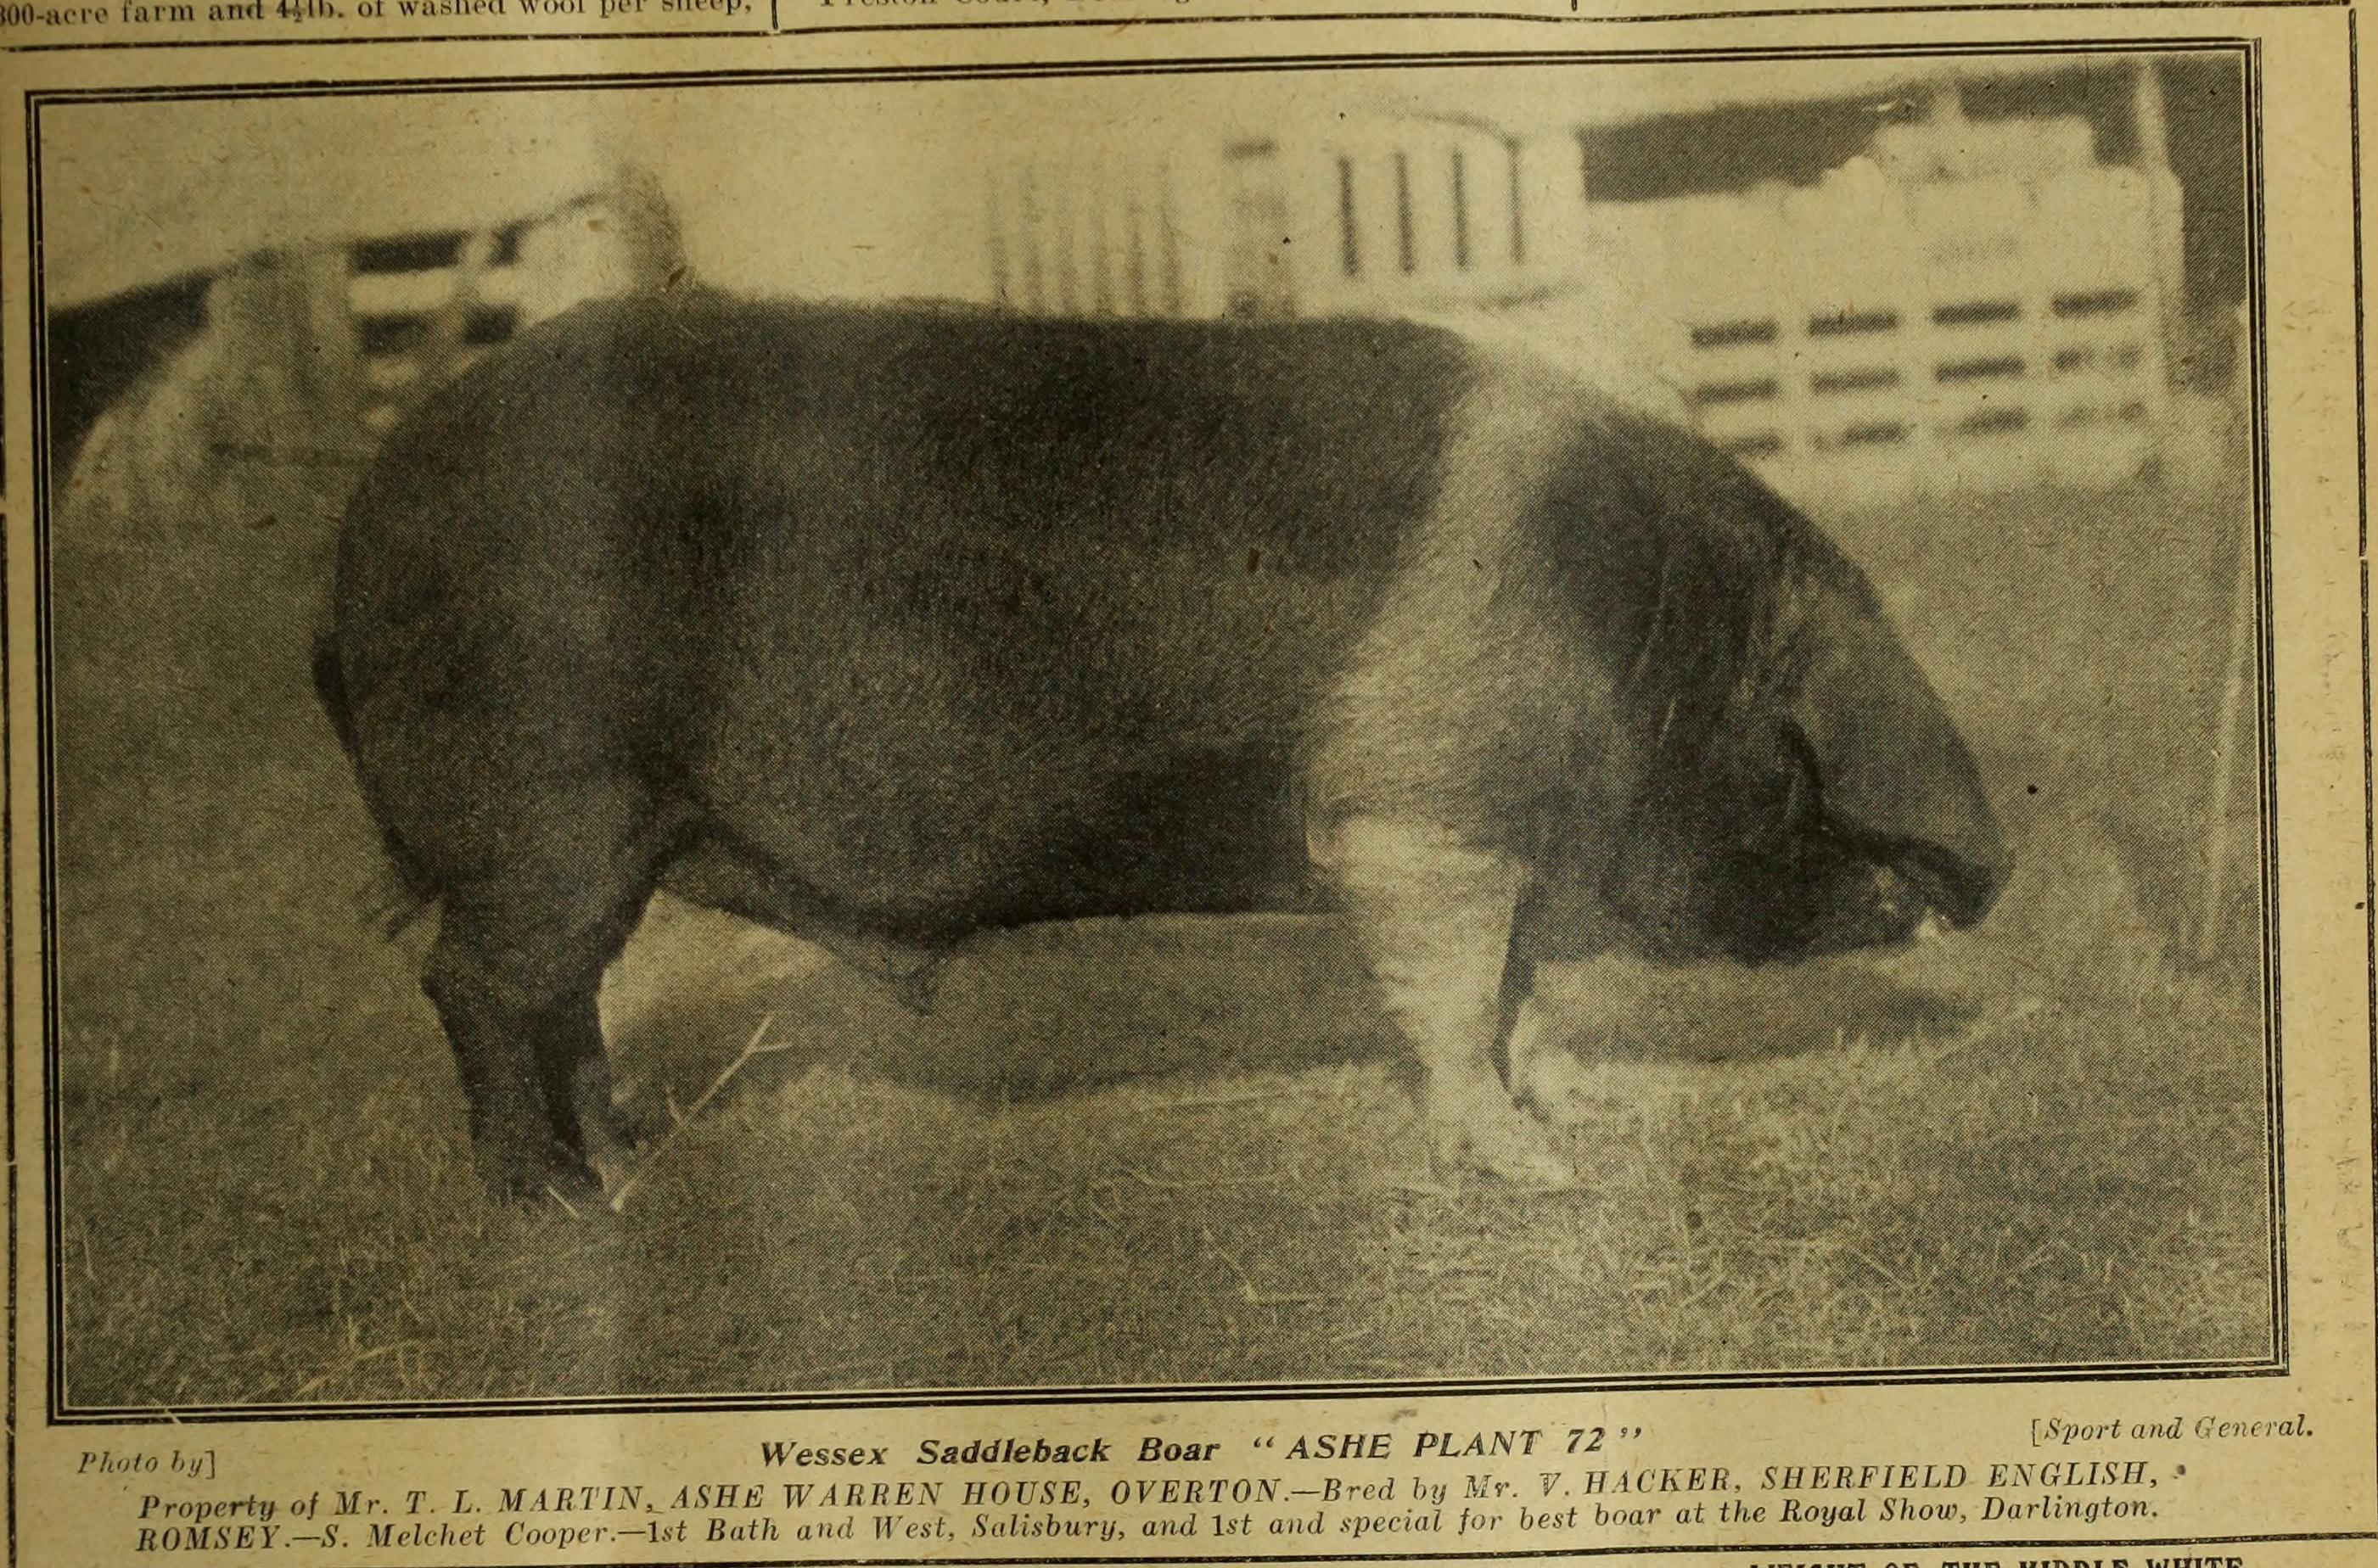 Wessex Saddleback - Farmer_and_stockbreeder_(1920)_(14774931601).jpg